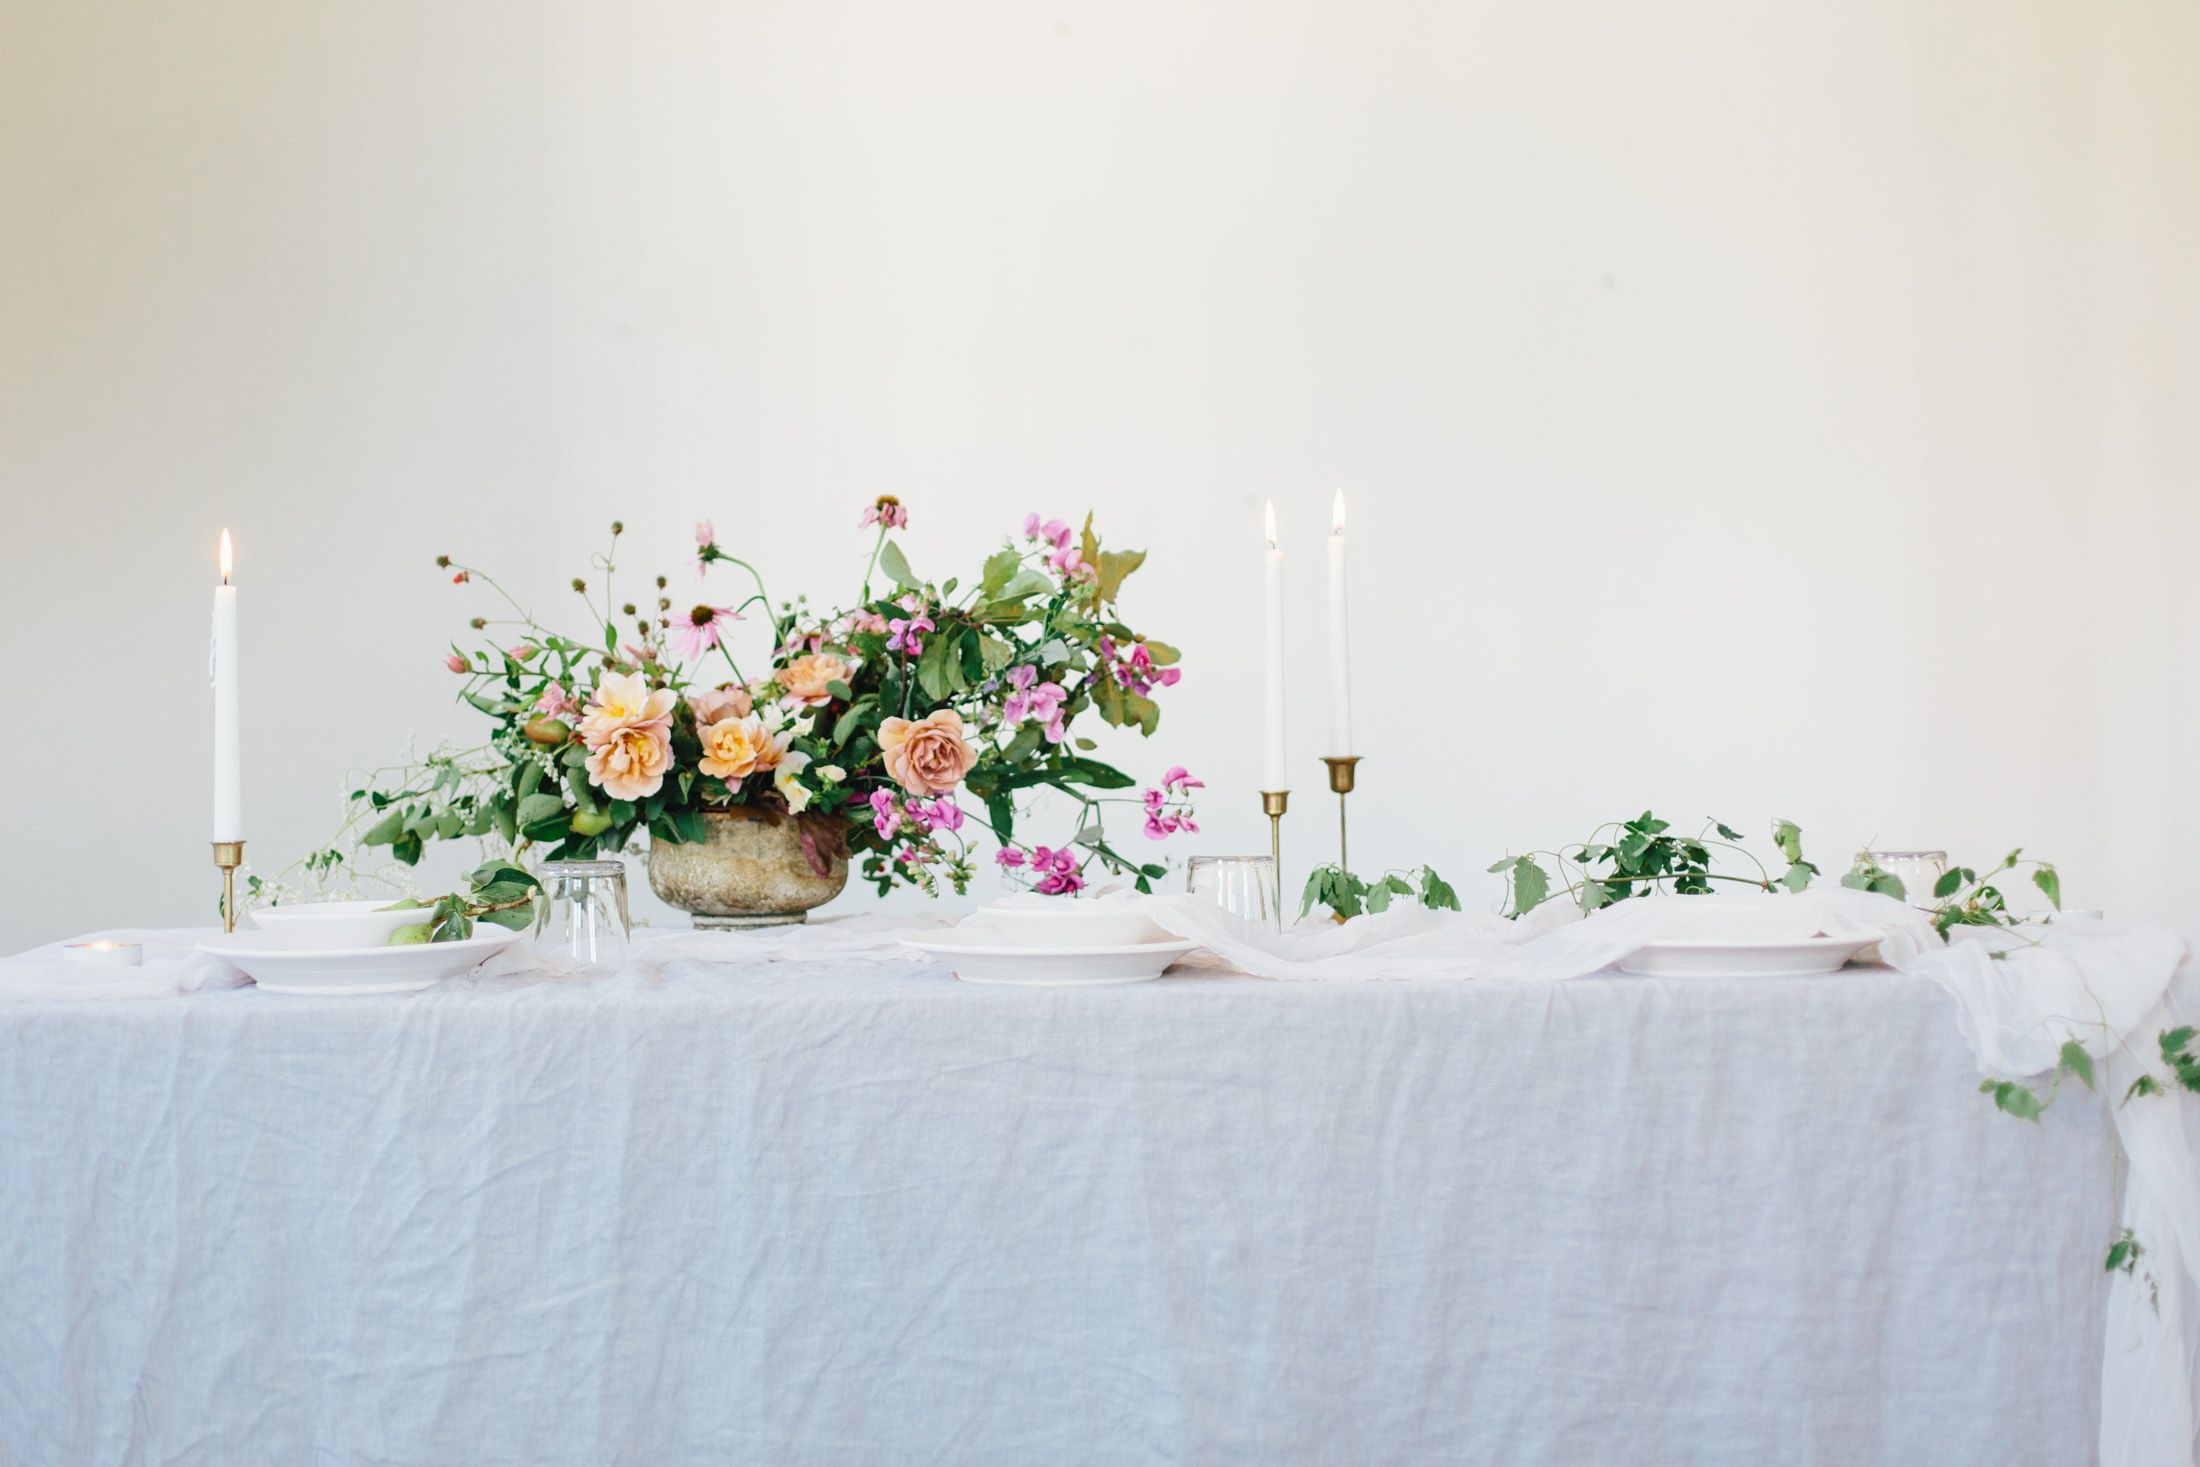 20 Christmas Flower Arrangements - Winter Holiday Flower Arranging Ideas